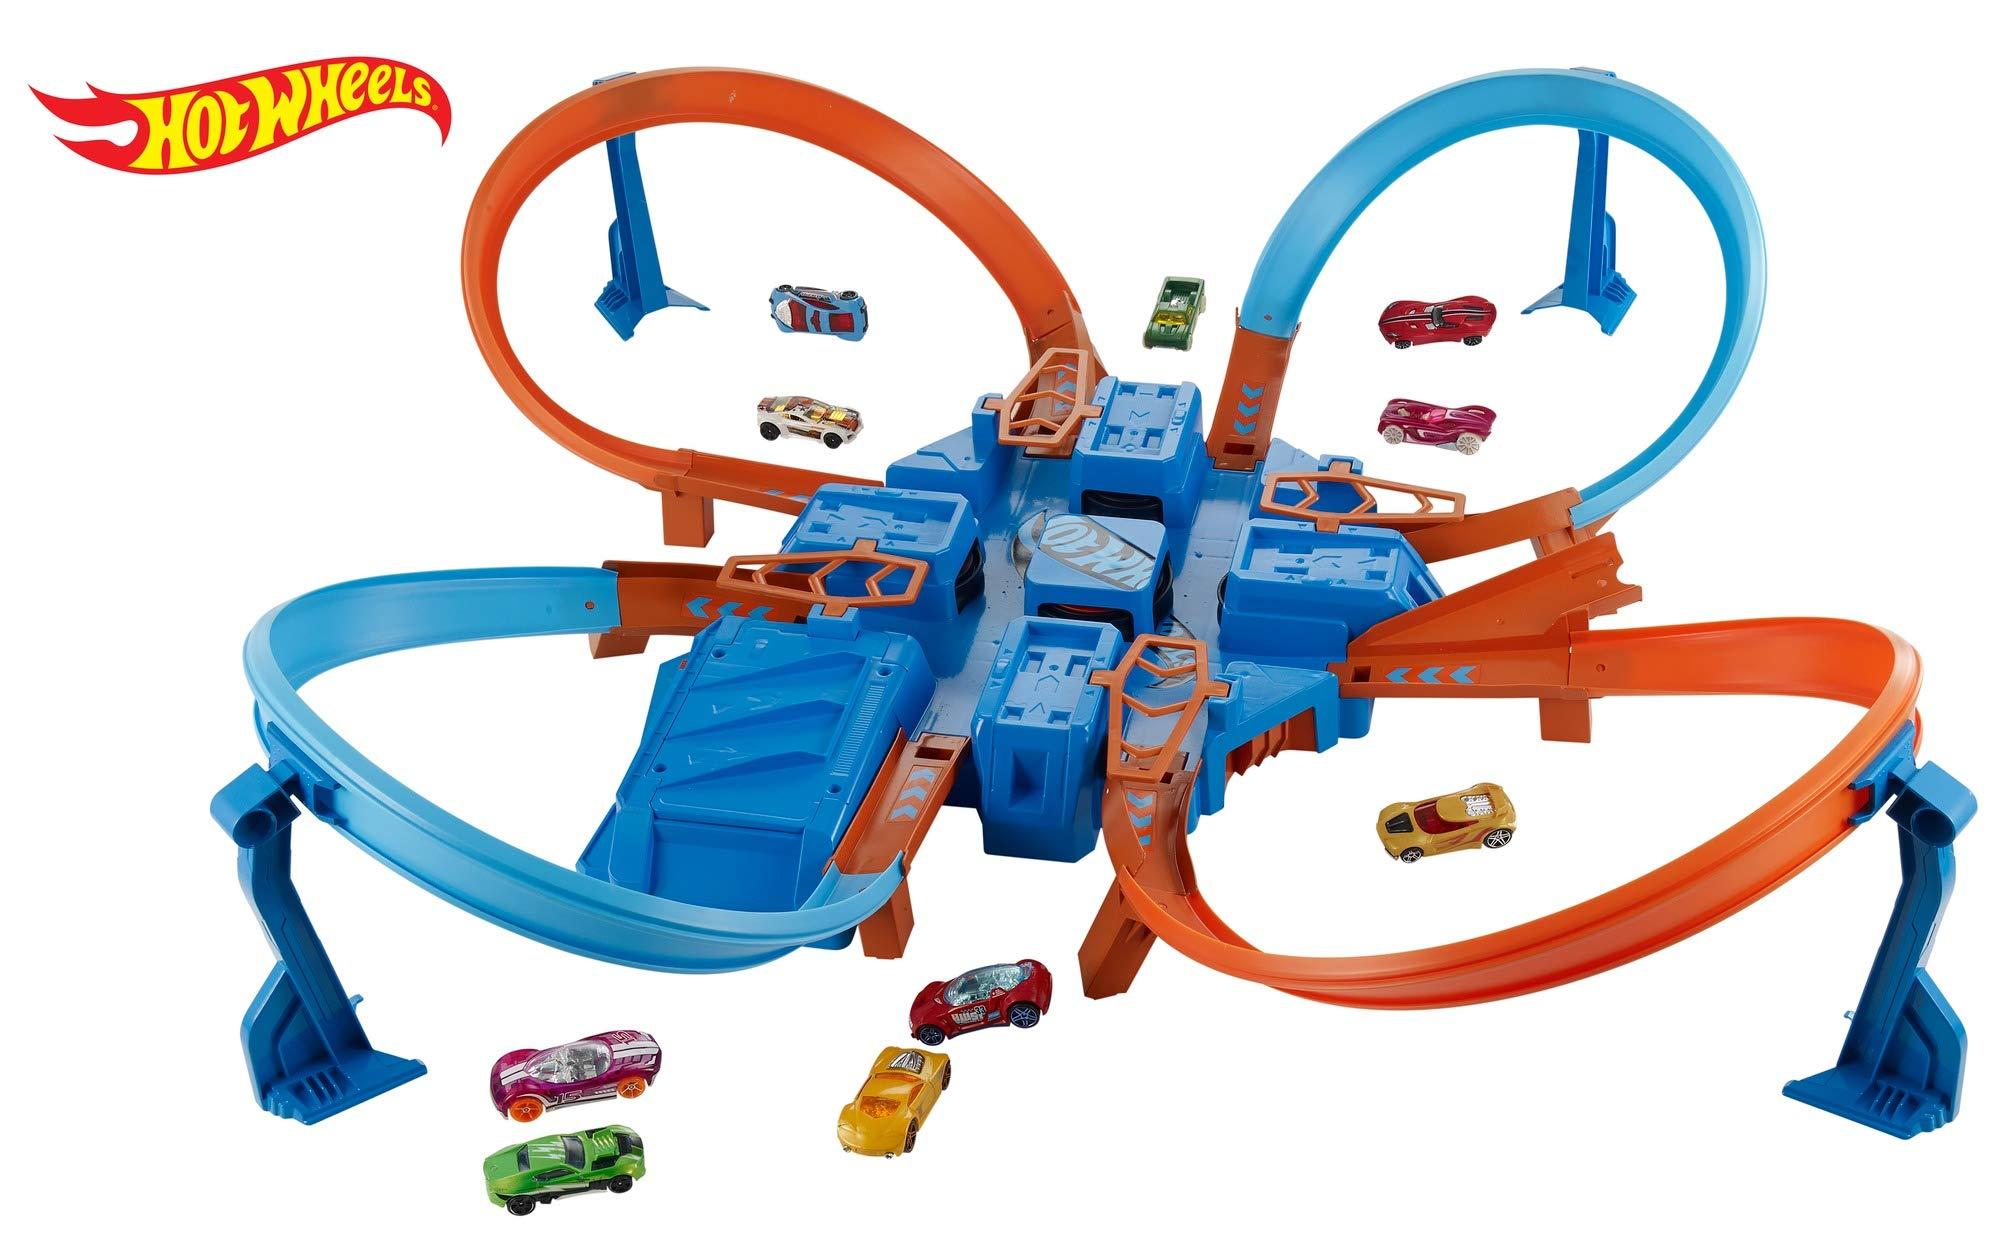 Hot Wheels Criss Cross Crash Track Set [Amazon Exclusive] by Hot Wheels